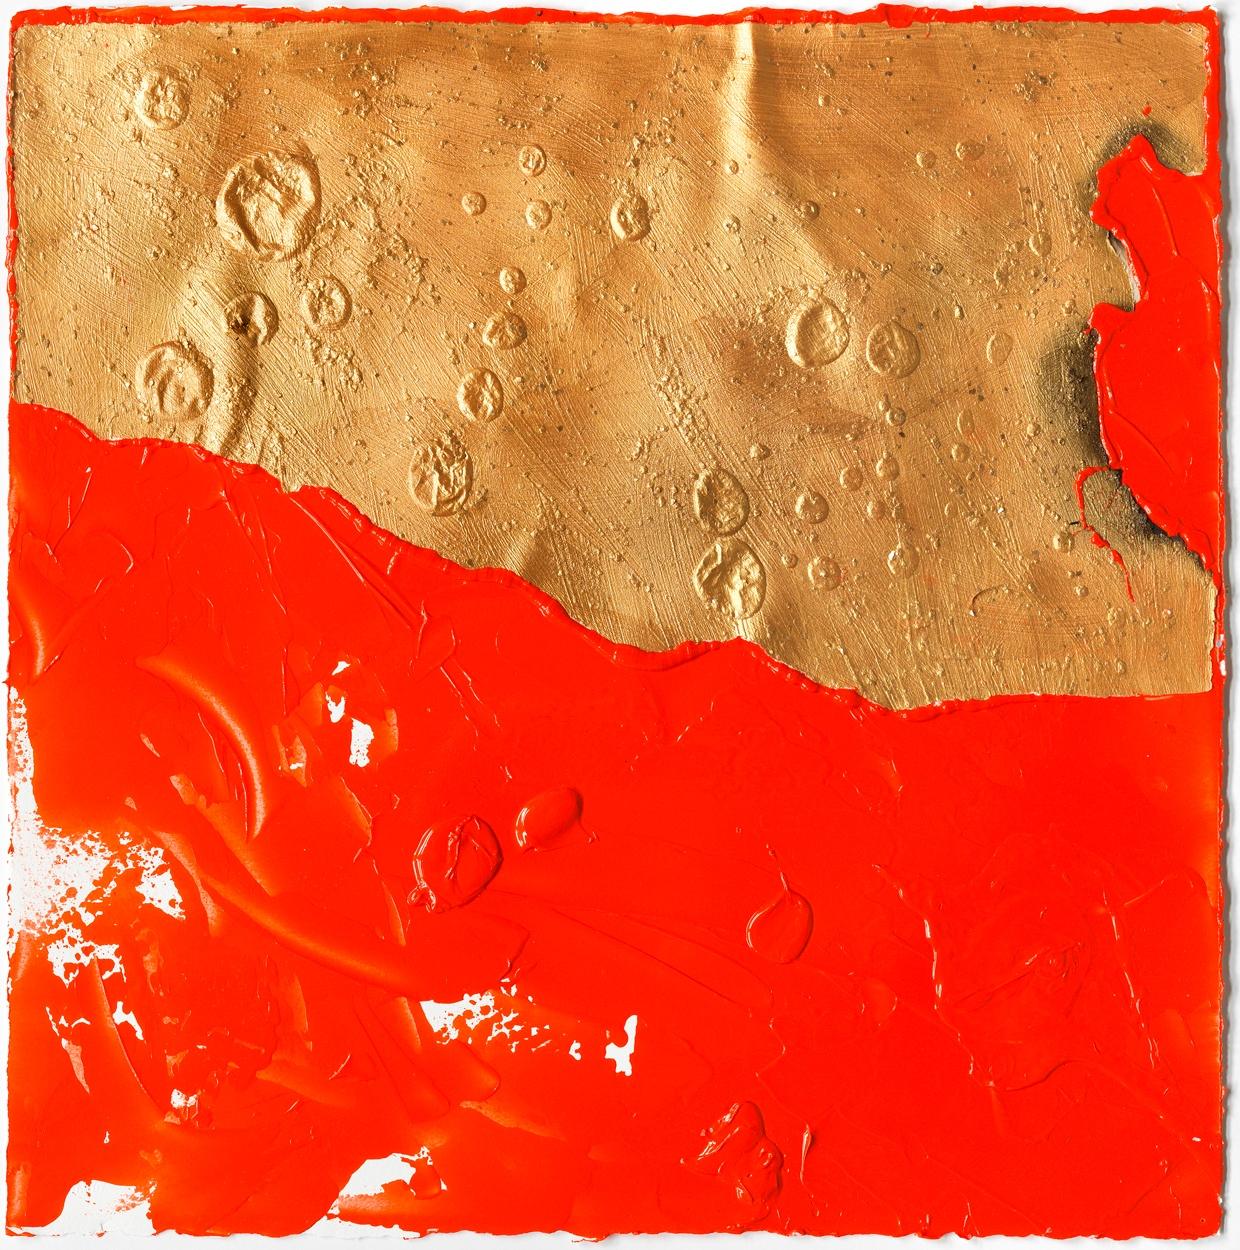 Lynn_Basa_Orange_and_Gold-4_web_no_text.jpg